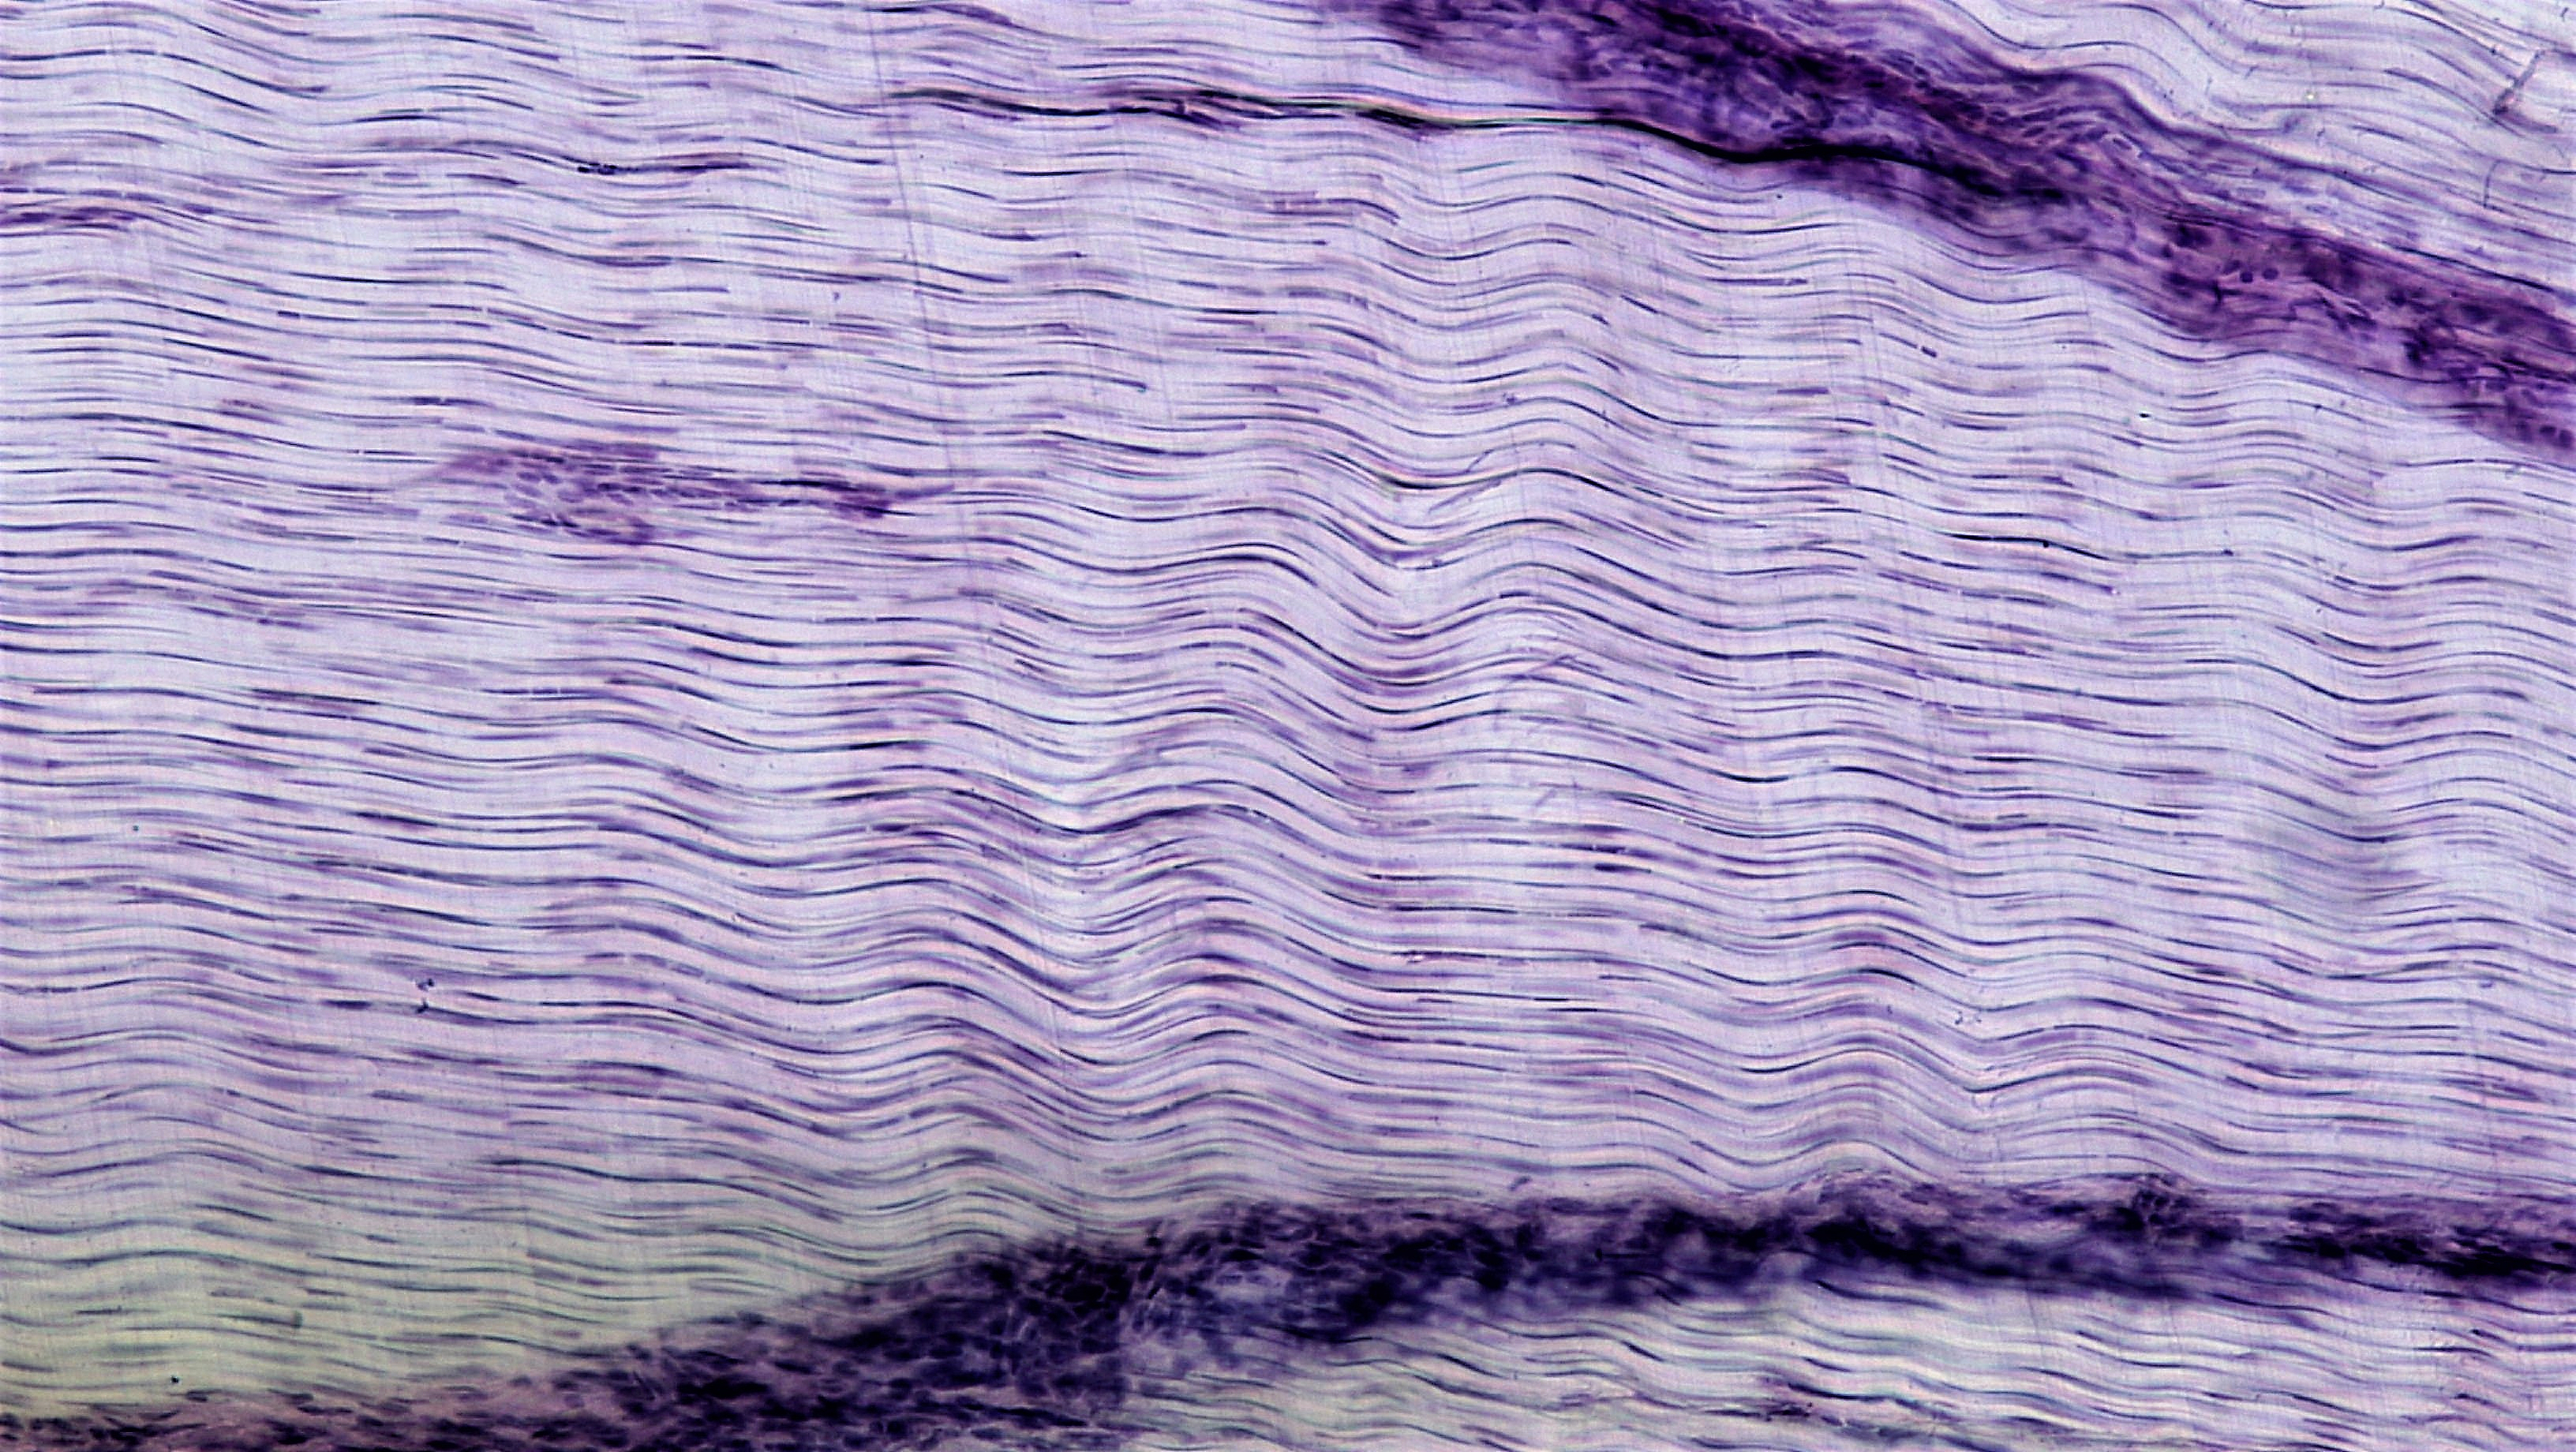 Fileconnective Tissue White Fibrous Connective 26987100397g